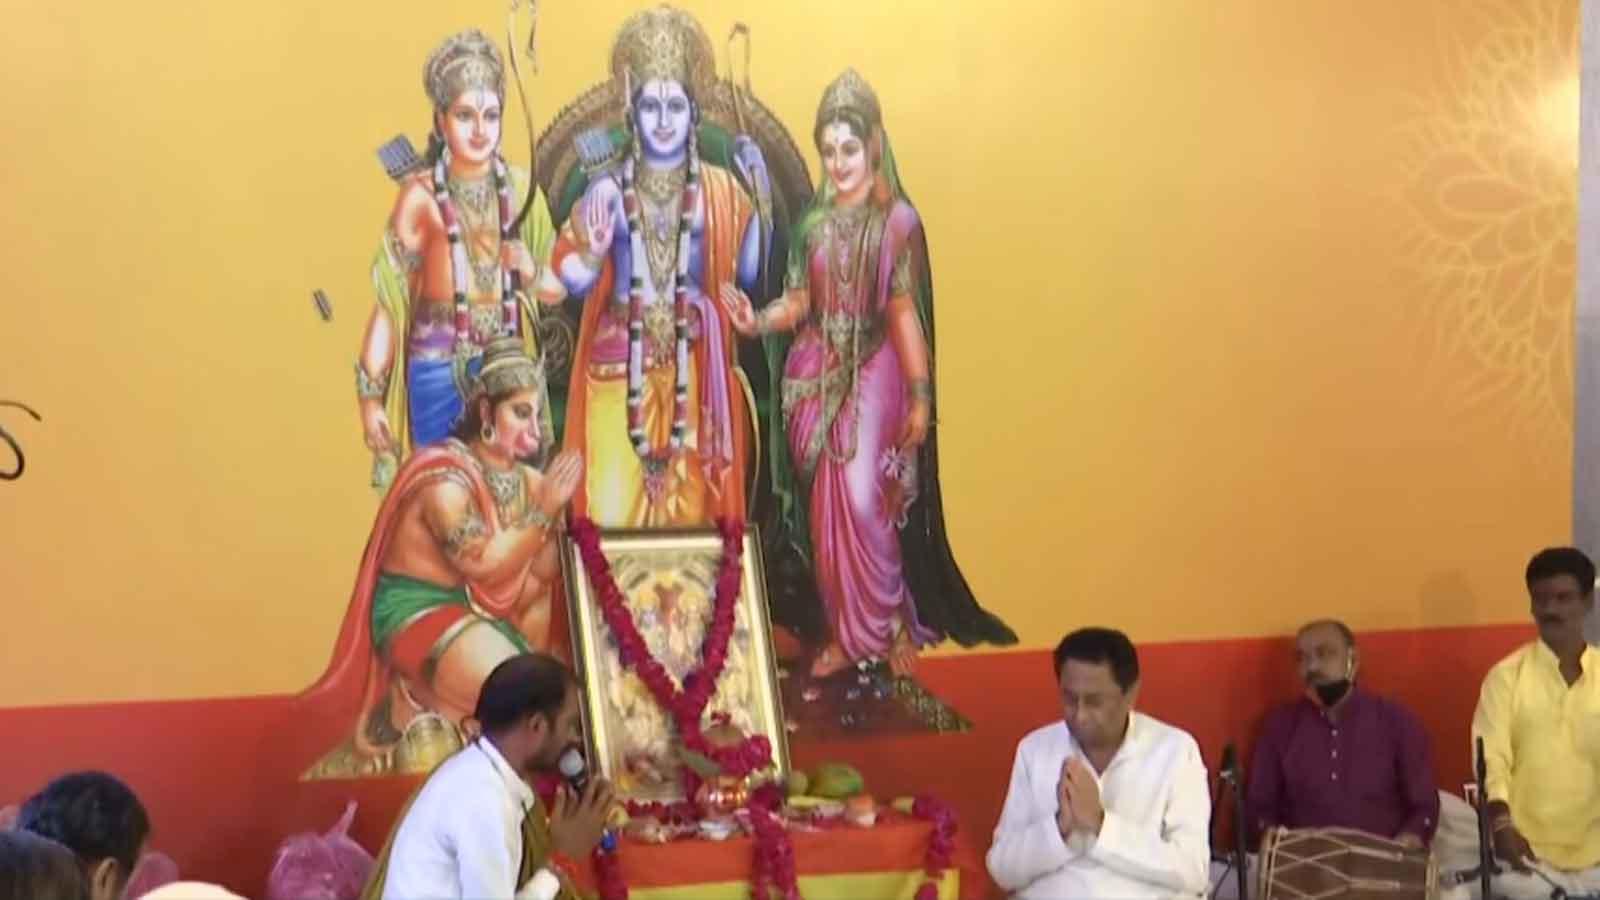 were-sending-11-silver-bricks-to-ayodhya-from-people-of-madhya-pradesh-kamal-nath